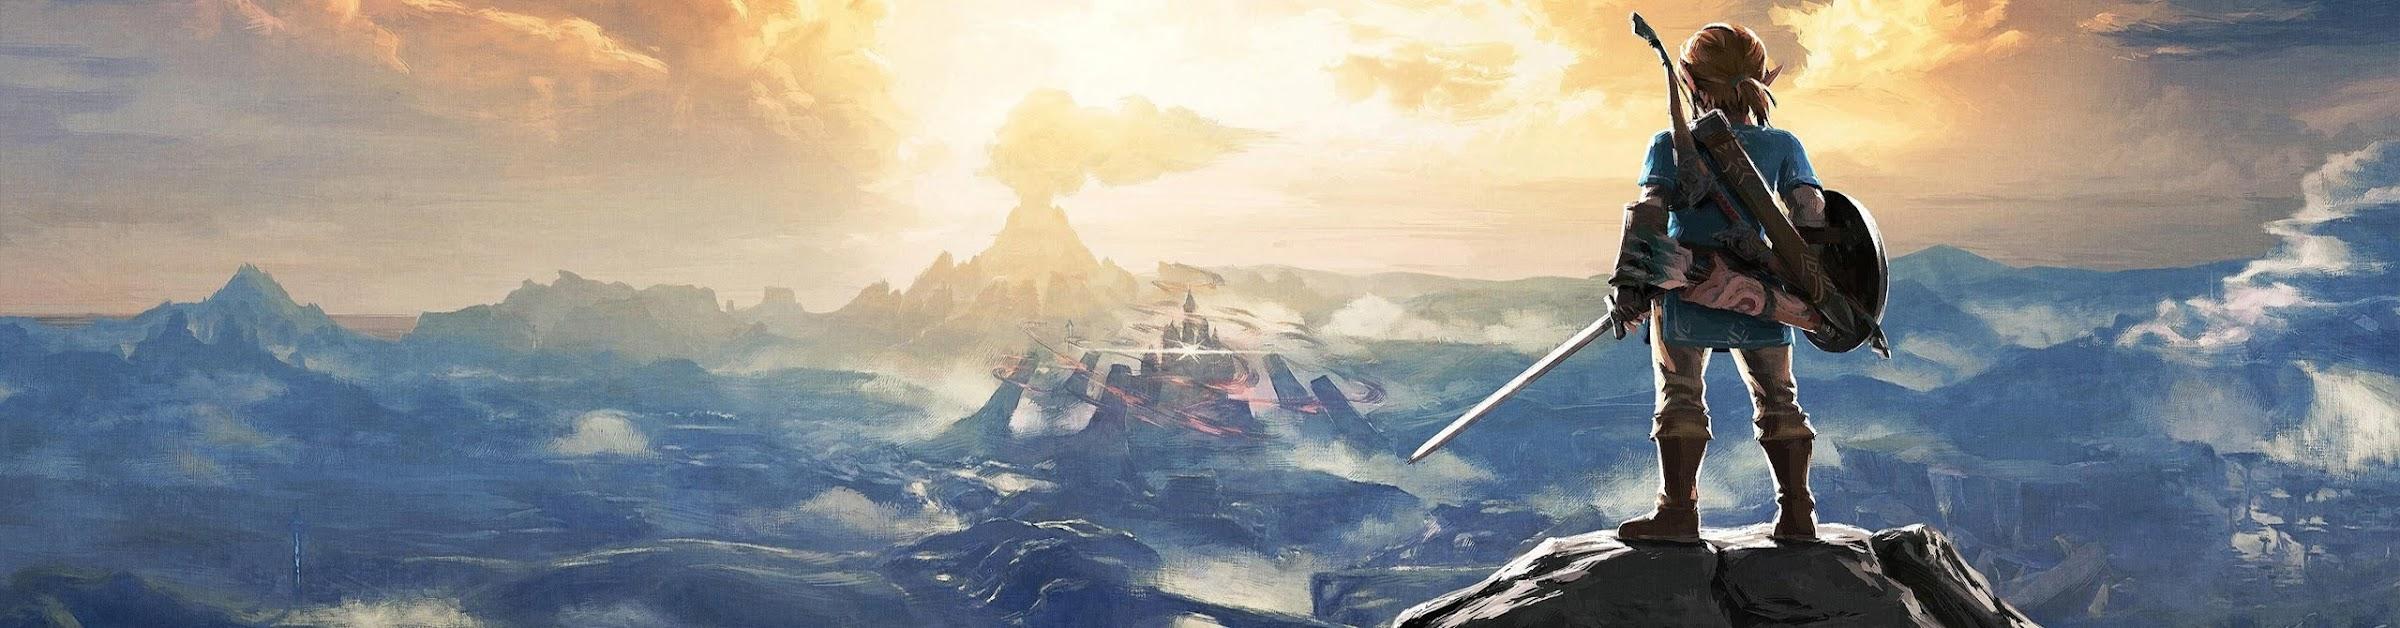 The Legend of Zelda: Breath of the Wild Việt Ngữ